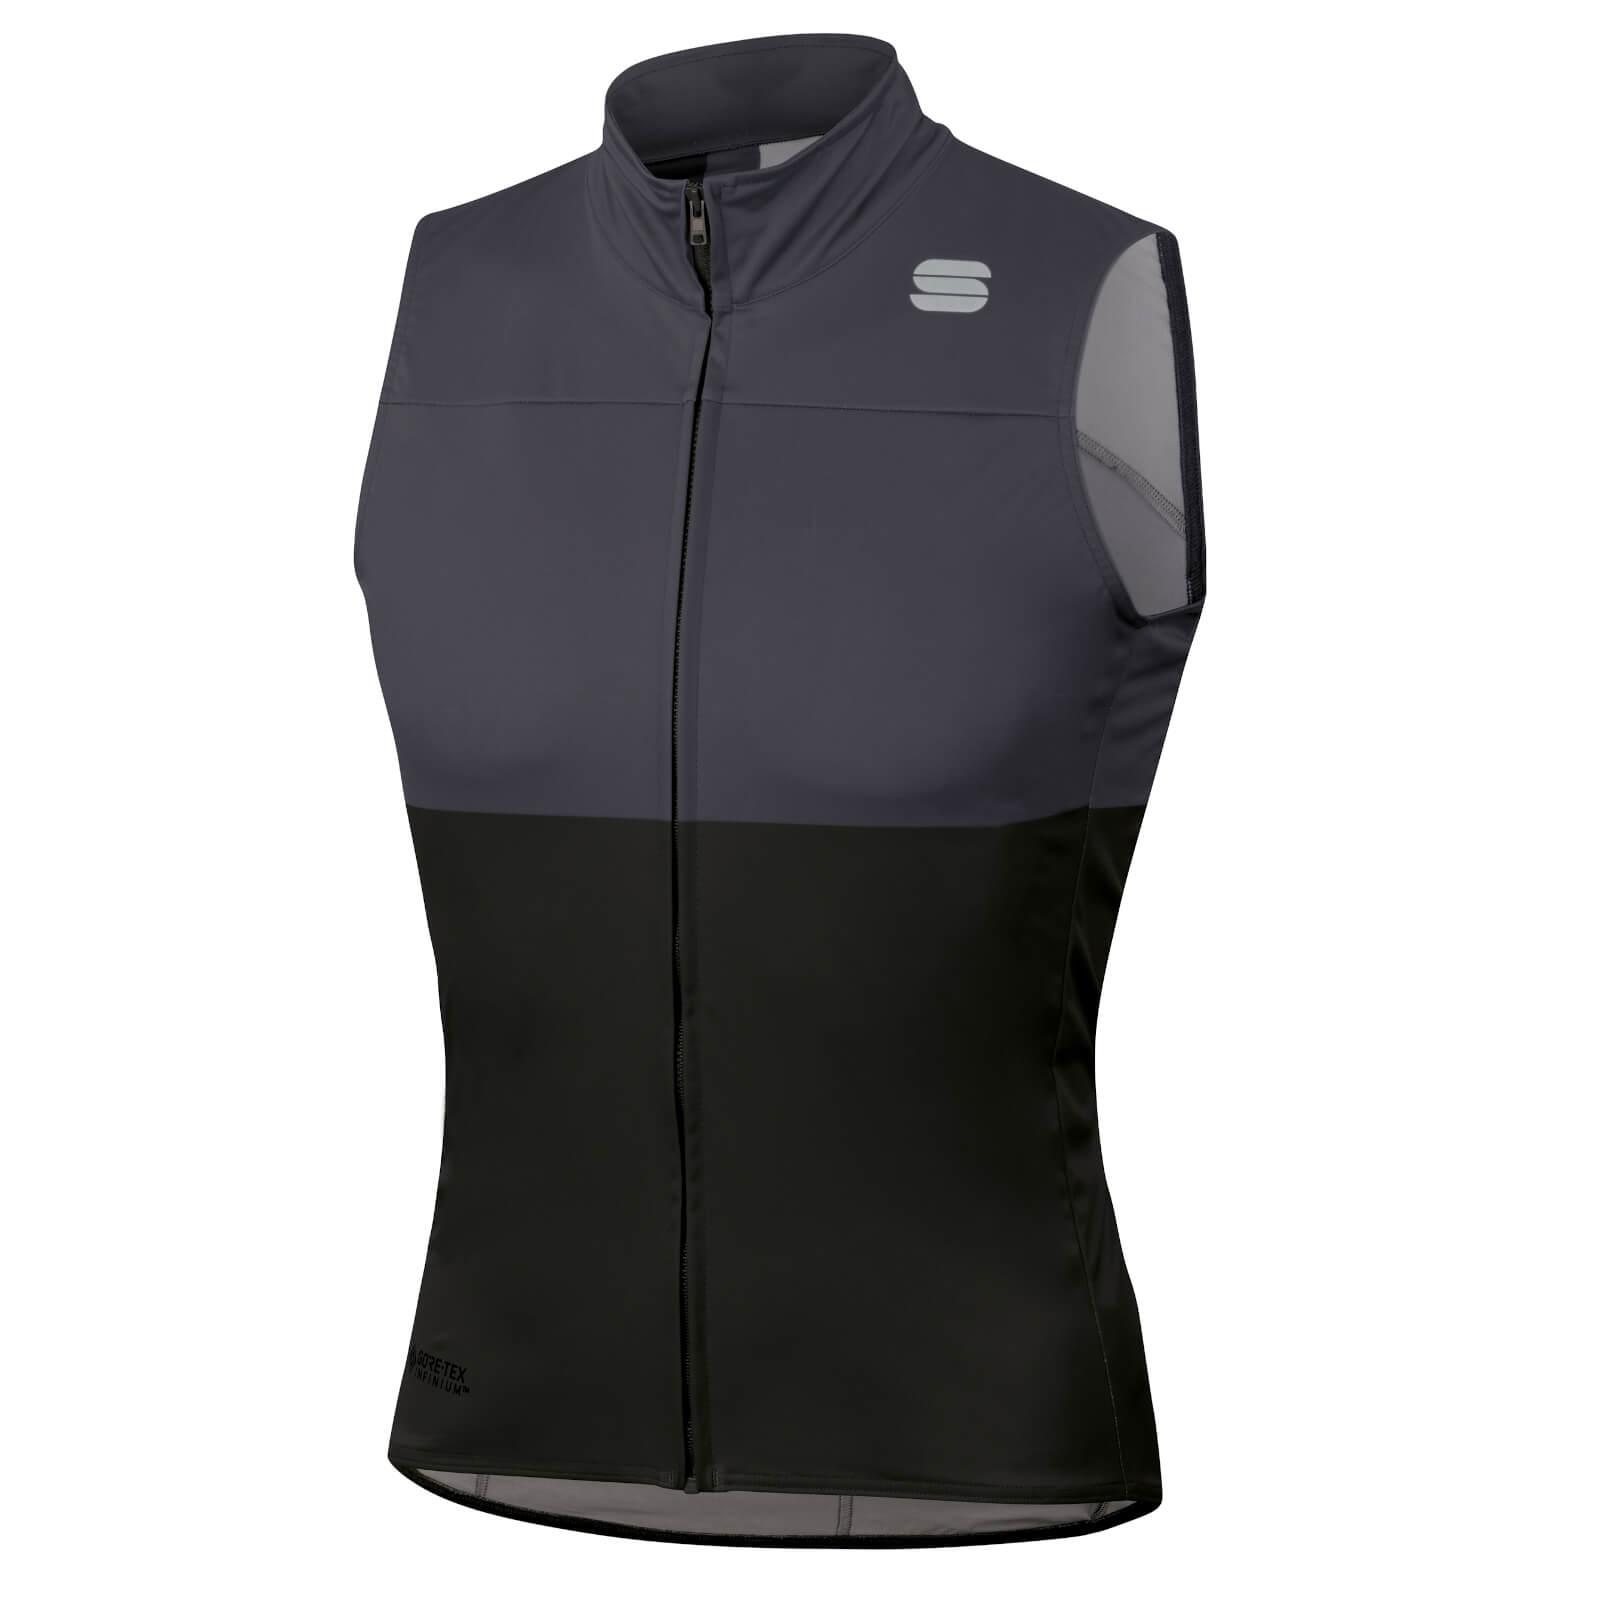 Sportful BodyFit Pro Vest - S - Black/Anthracite